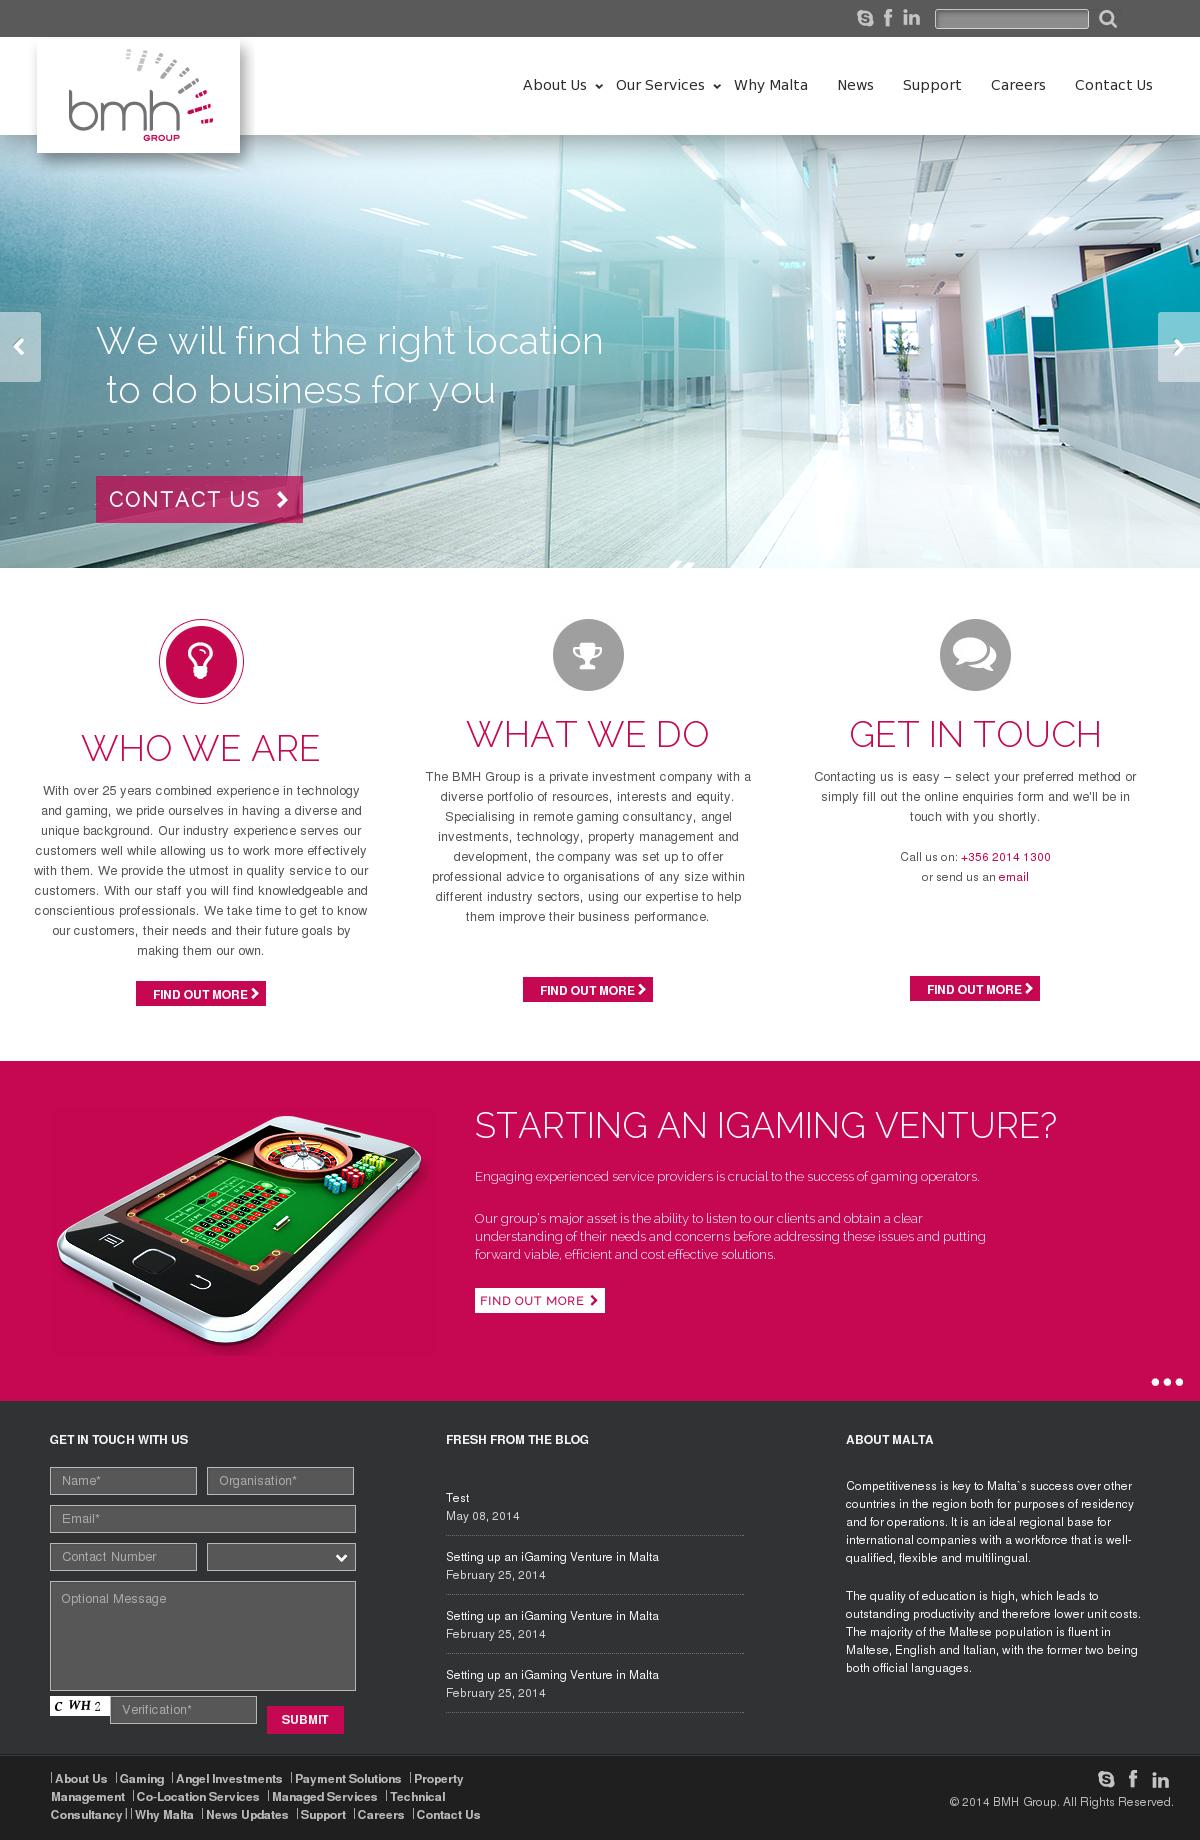 Bmhmalta Competitors, Revenue and Employees - Owler Company